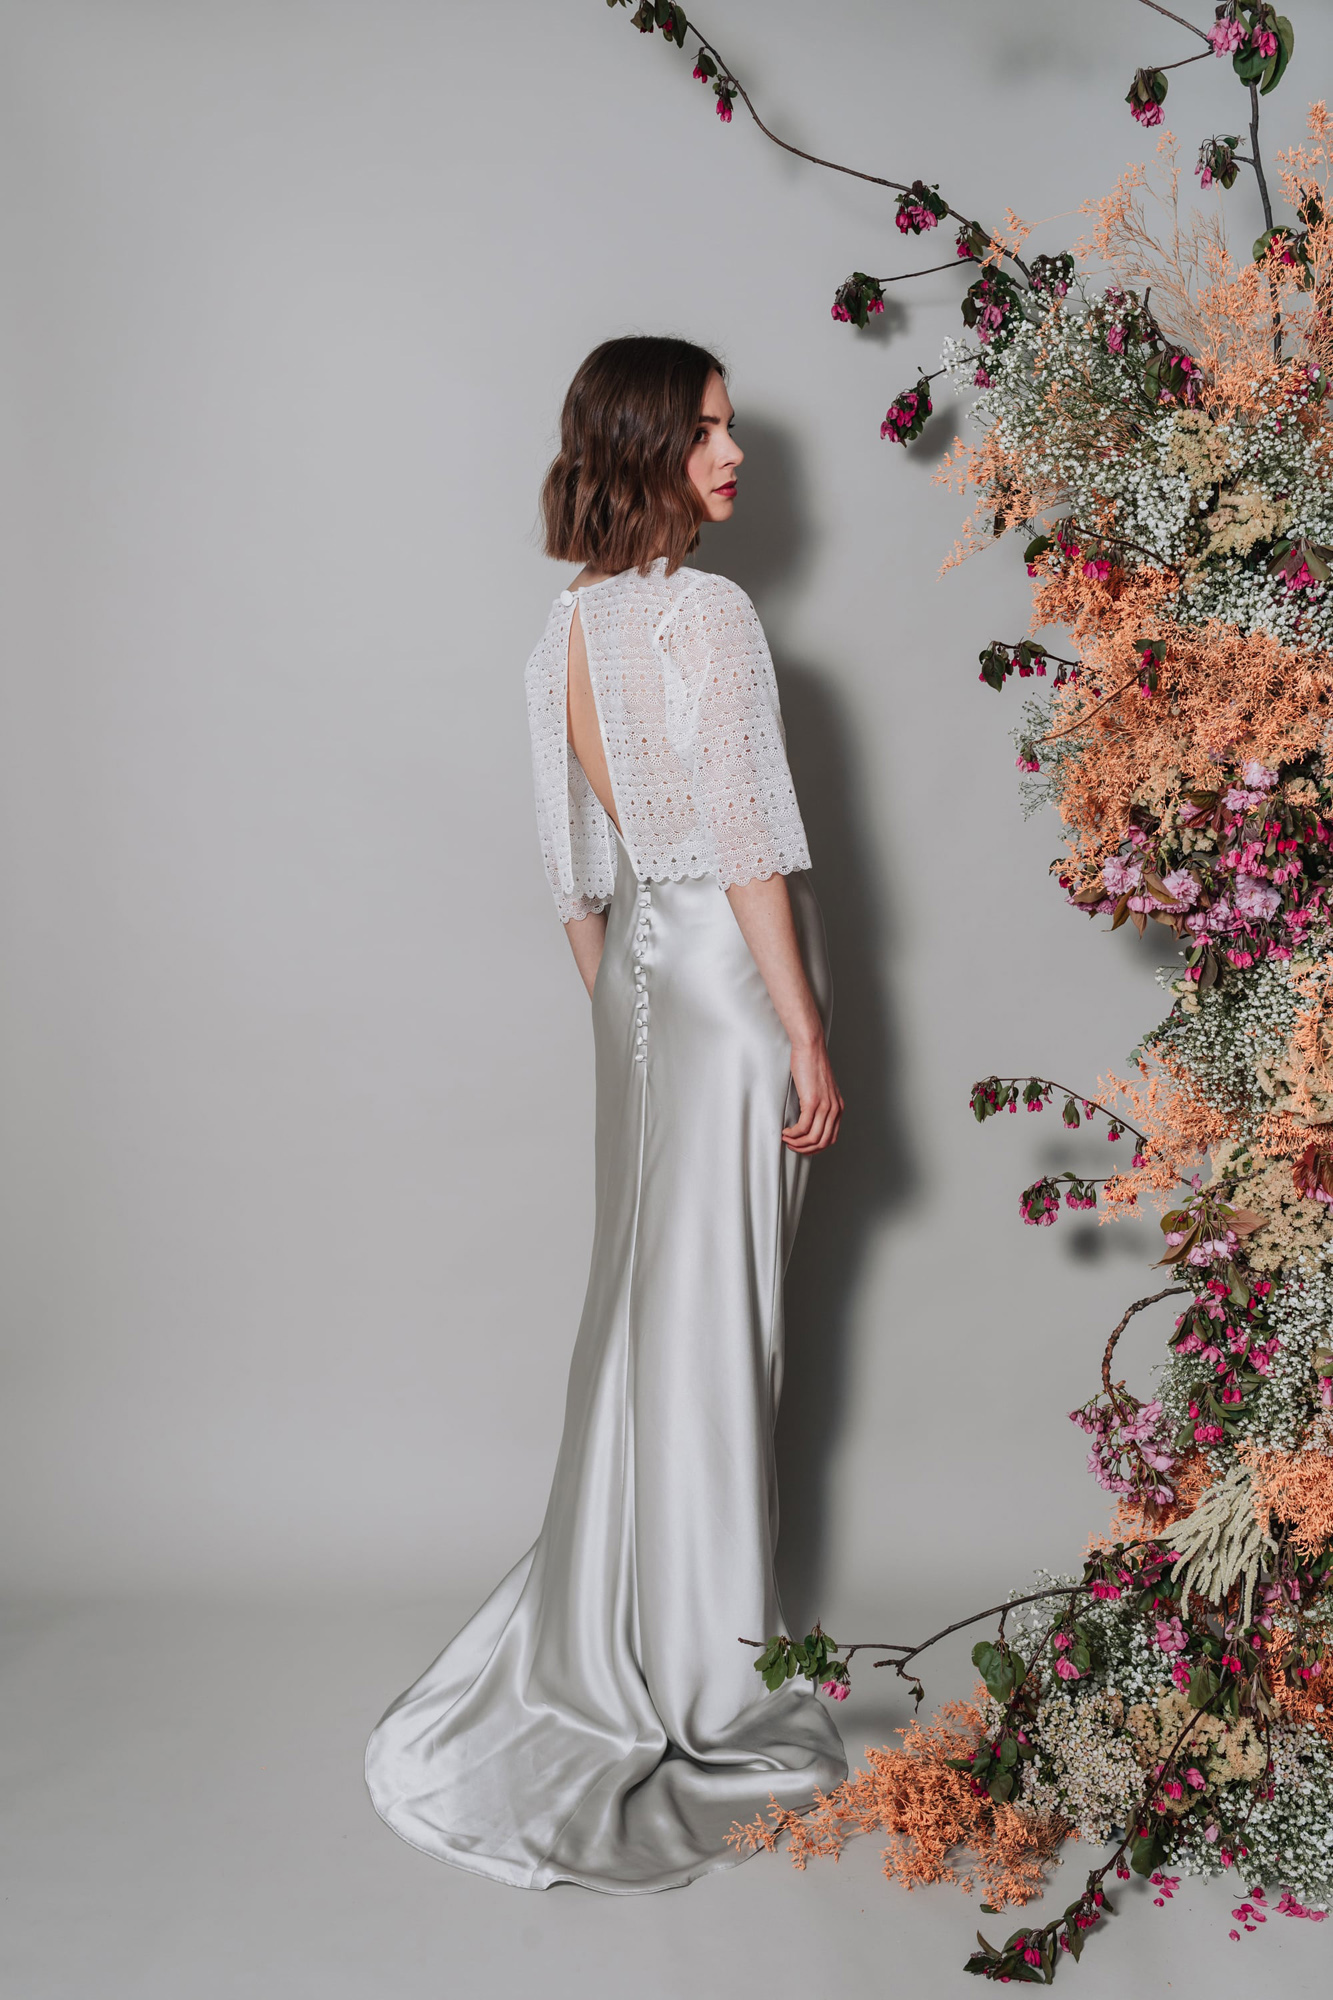 Kate-Beaumont-Sheffield-Cosmos-Minimal-Modern-Silver-Silk-Slip-Wedding-Dress-12.jpg